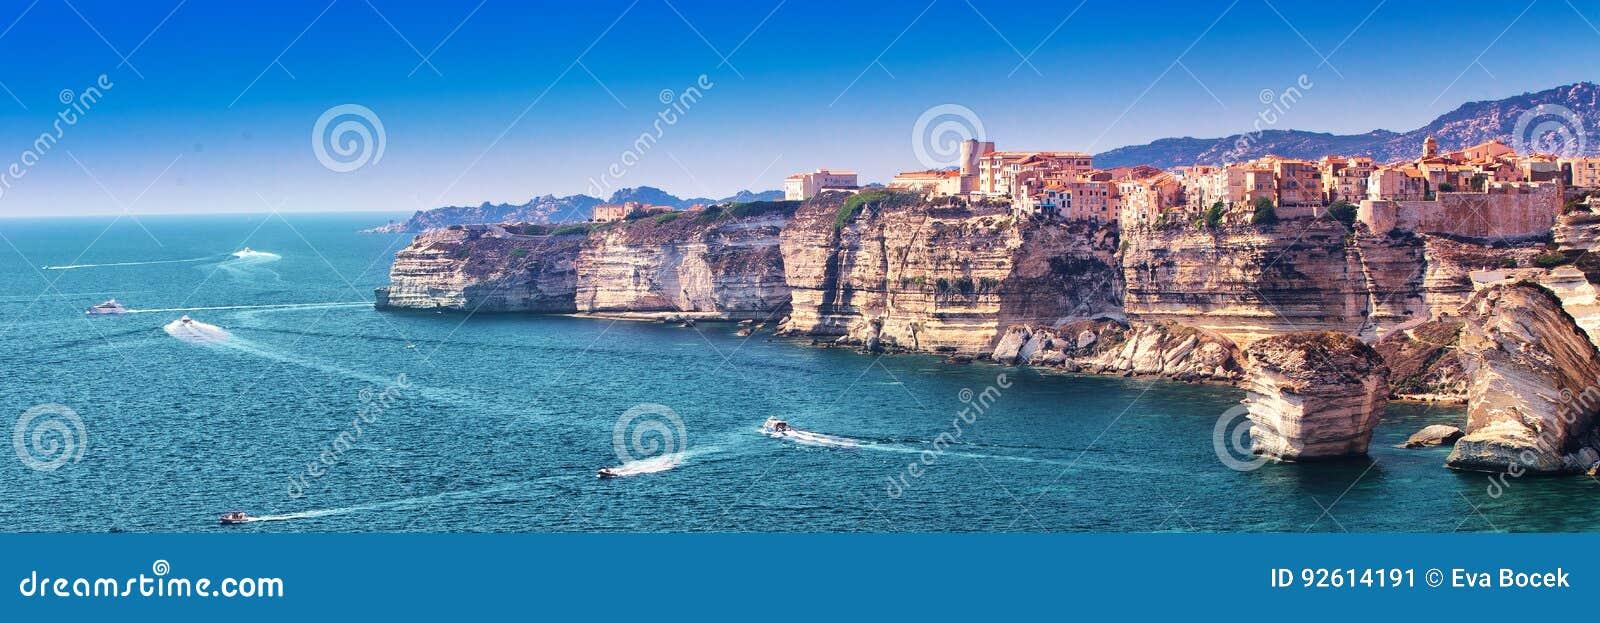 Bonifacio on beautiful white rock cliff with sea bay, Corsica, France, Europe.